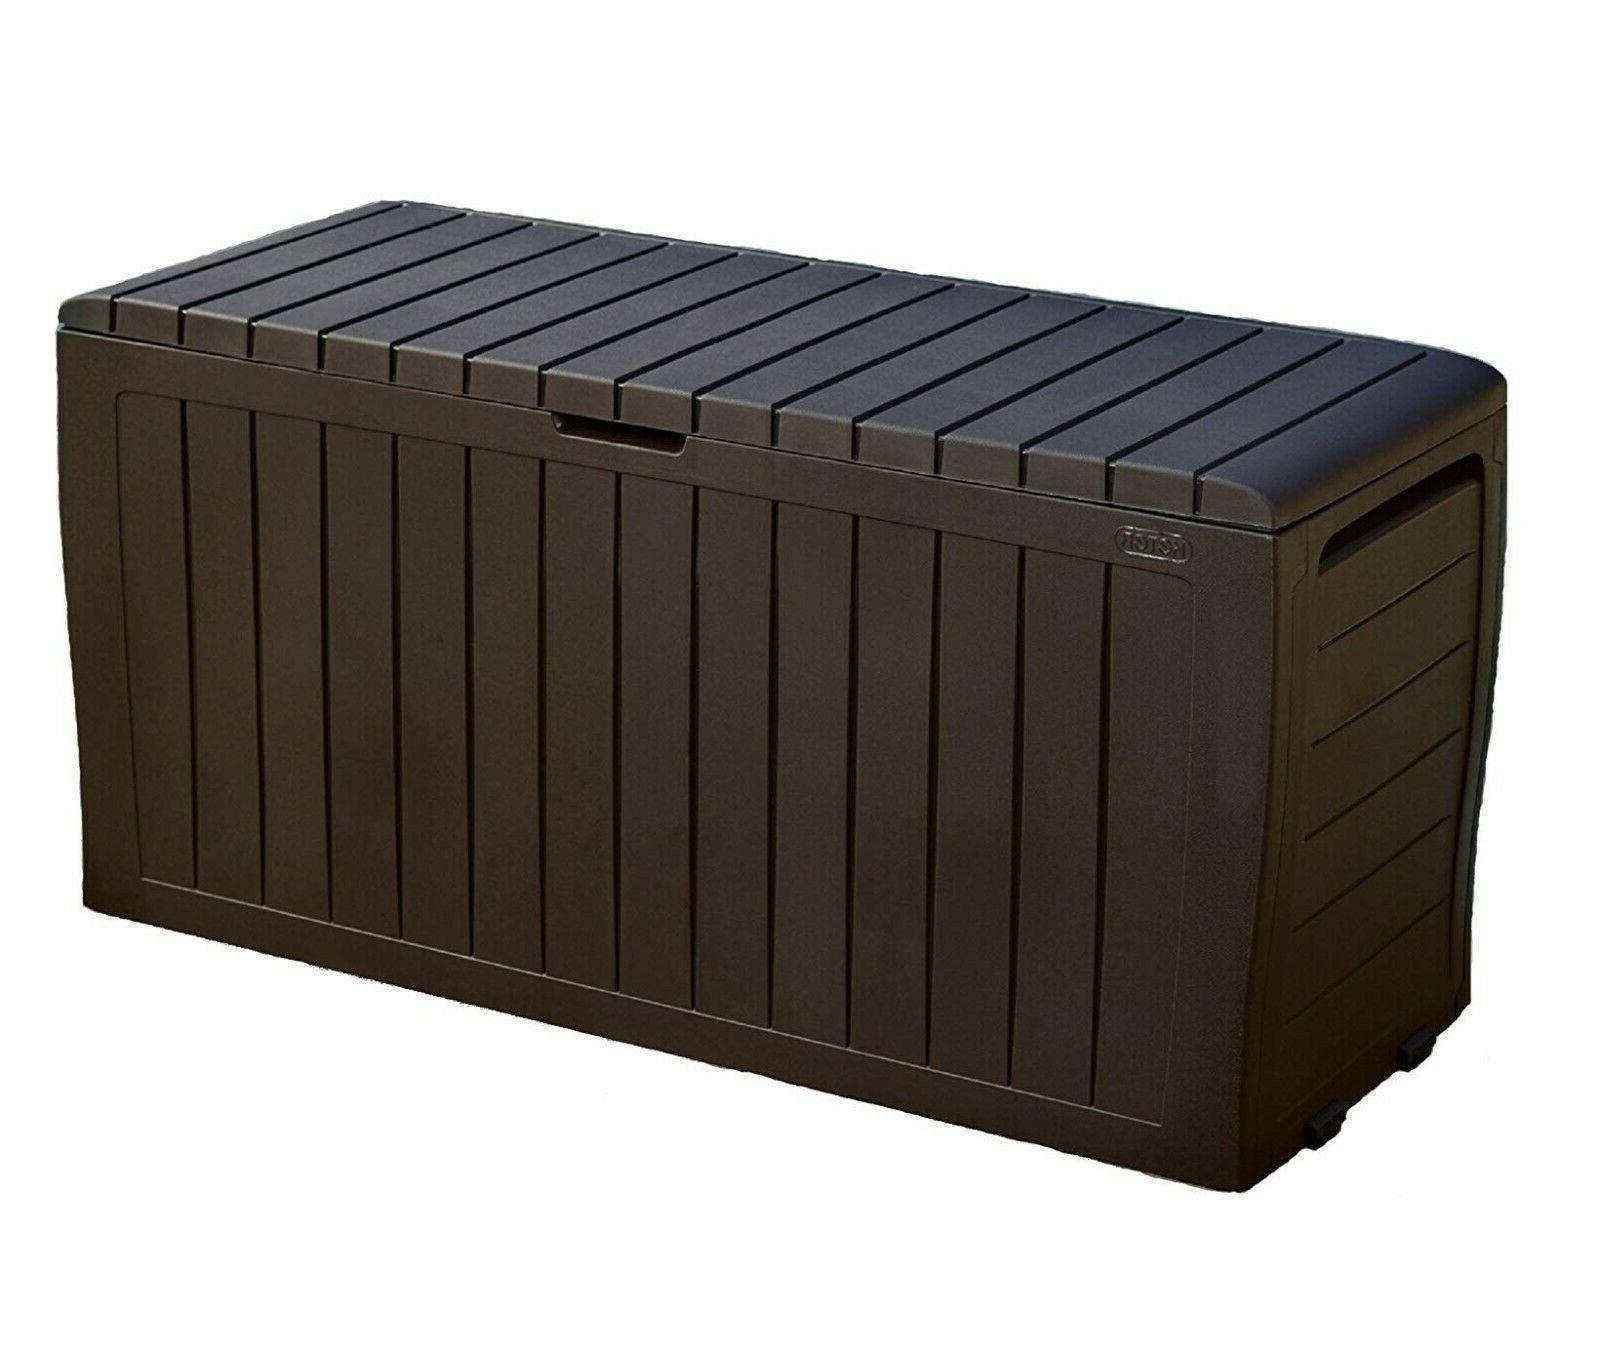 Keter Gallon Resin Storage Box for Furniture